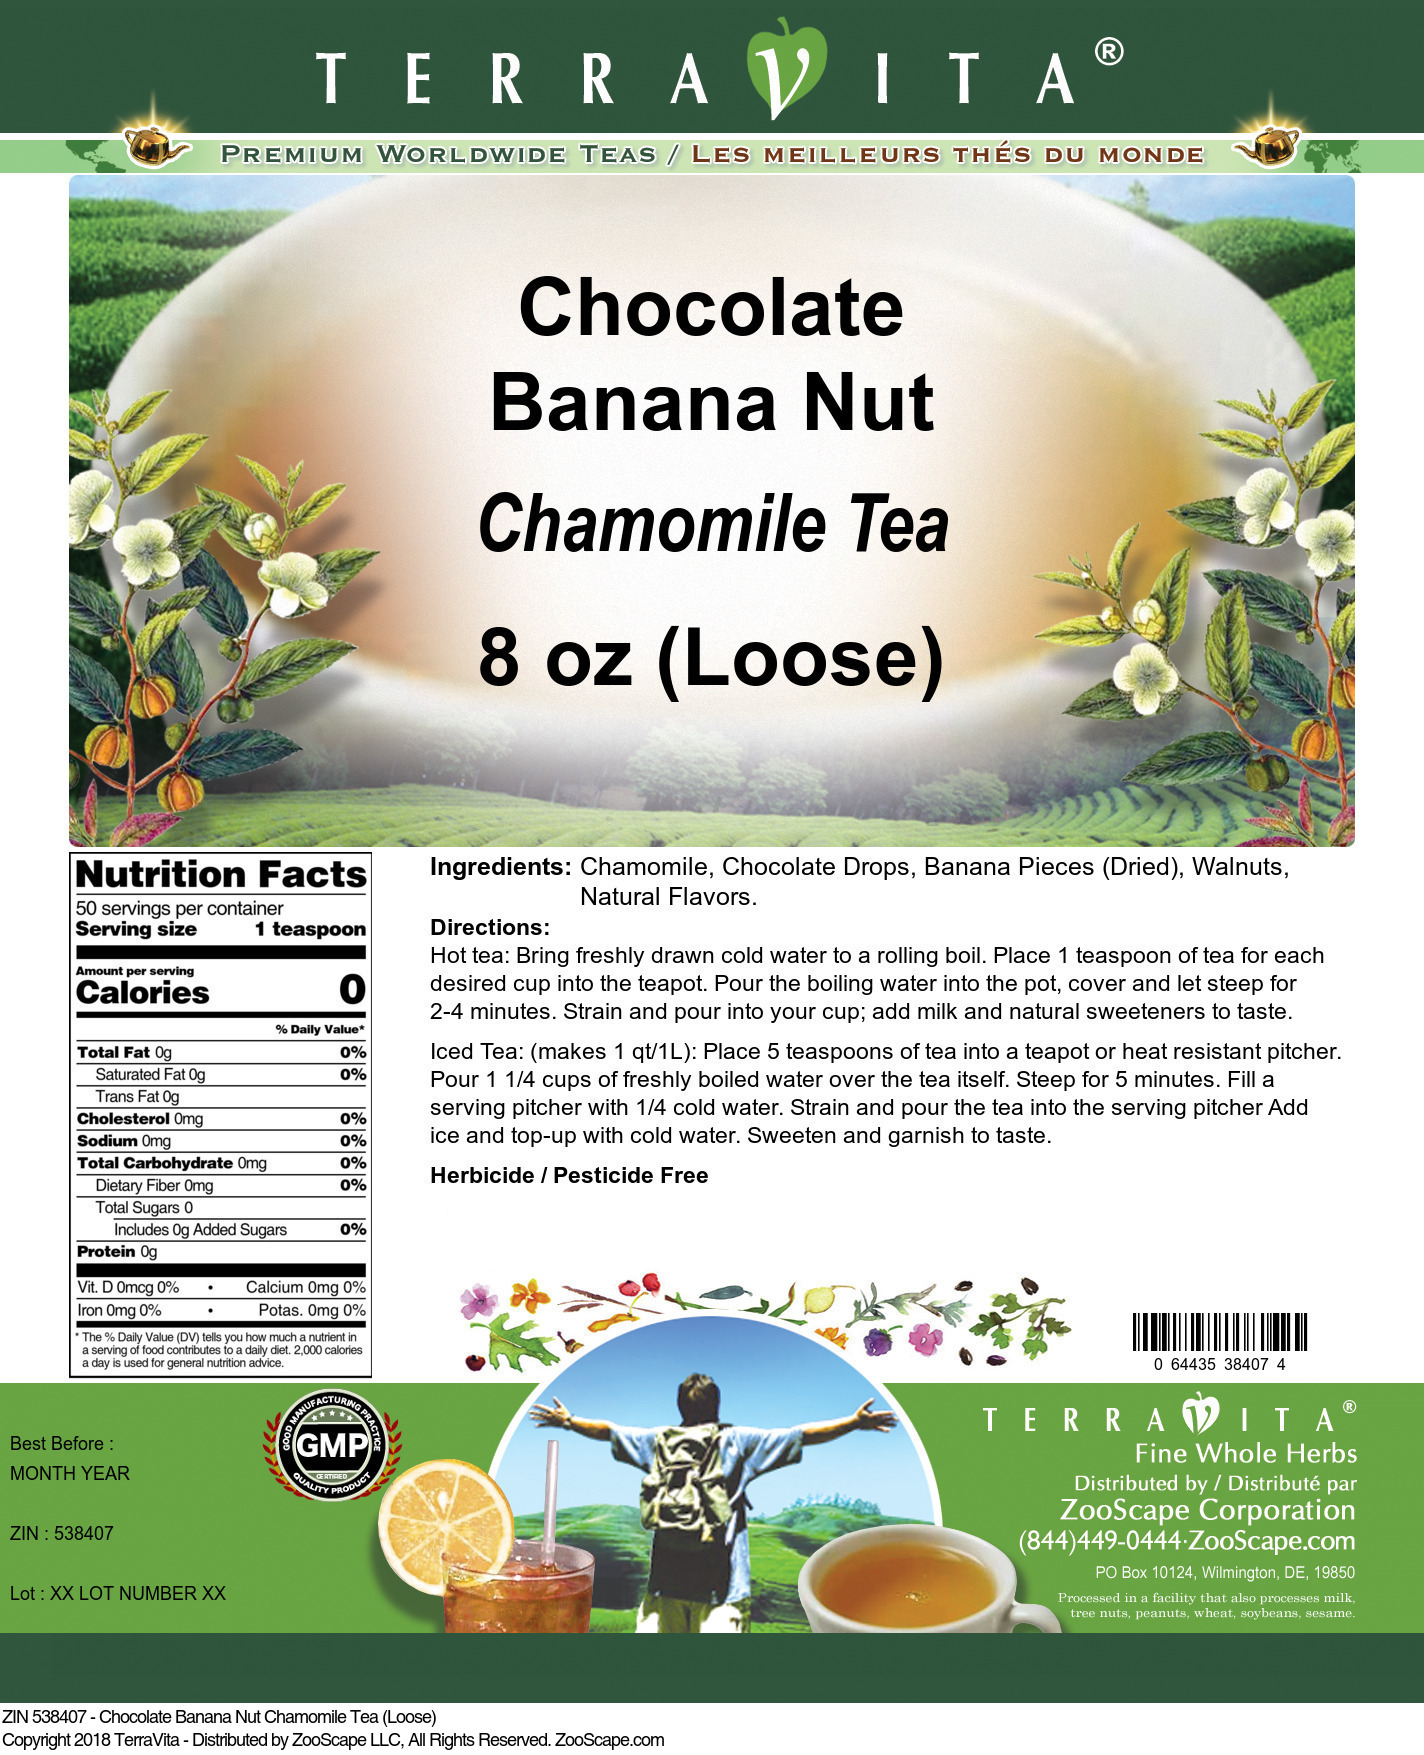 Chocolate Banana Nut Chamomile Tea (Loose)